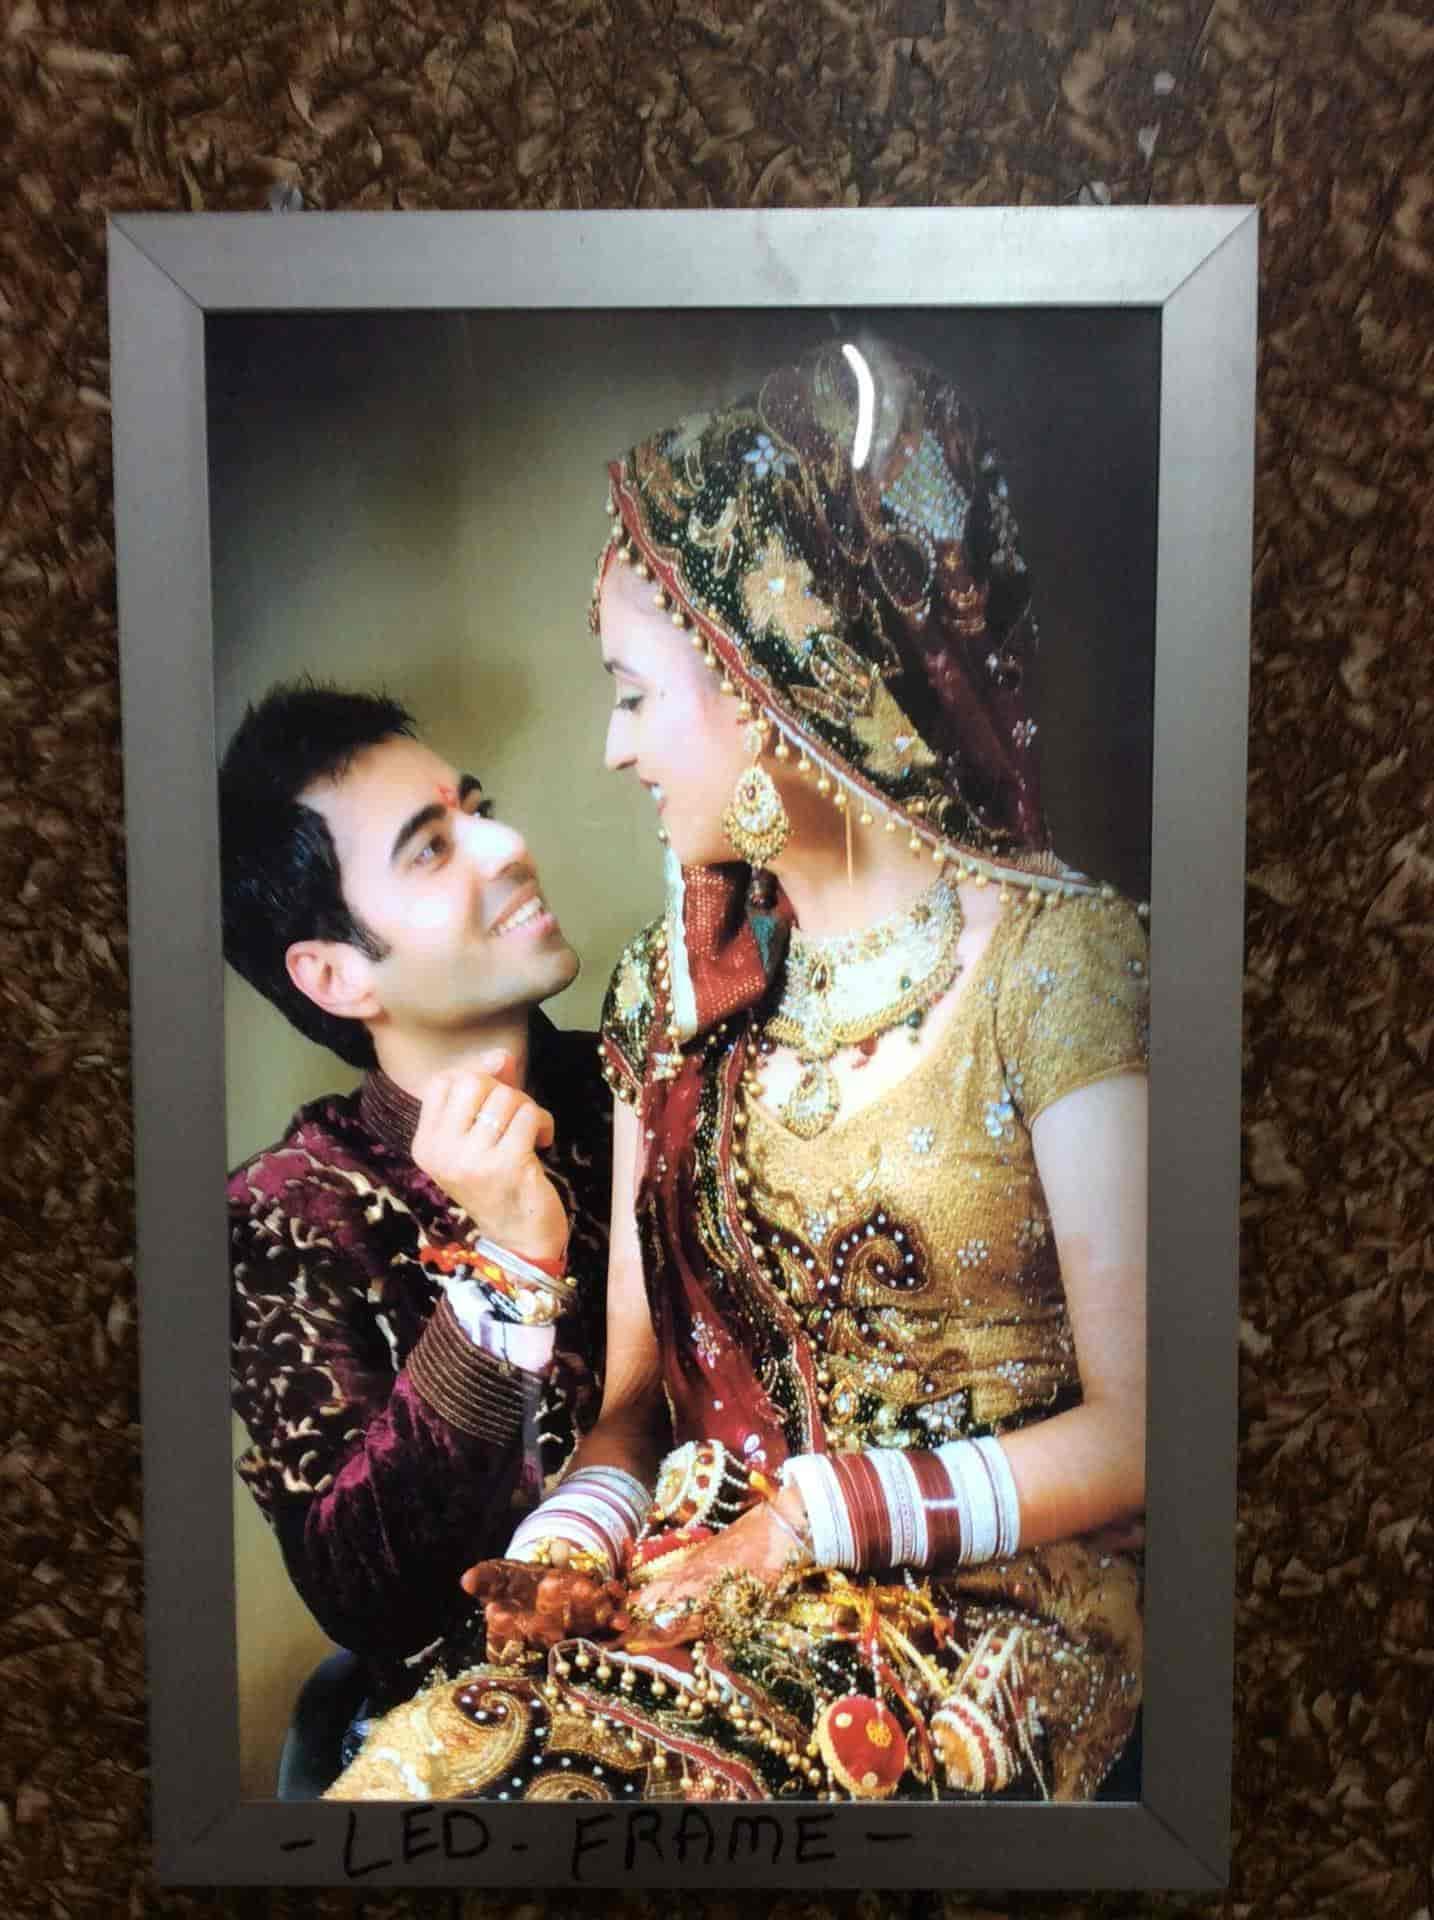 Canvera Album Designer Photos, Chander Nagar, Saharanpur